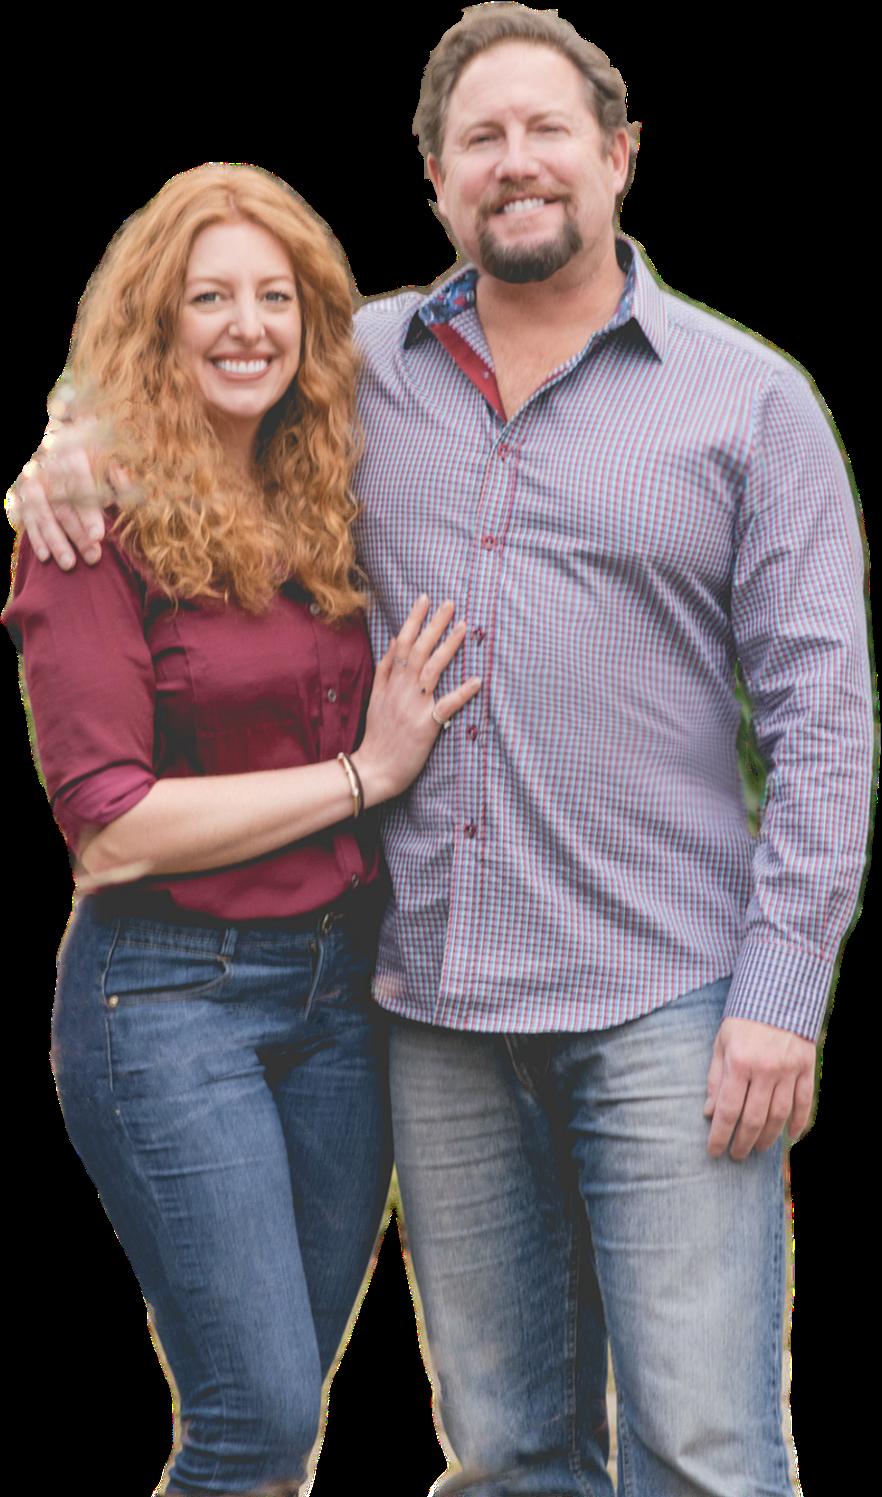 Best Matchmaker Boulder Best Dating coach Boulder Chris DeCicco Kendra Seoane Evolve Dating Gurus about.png